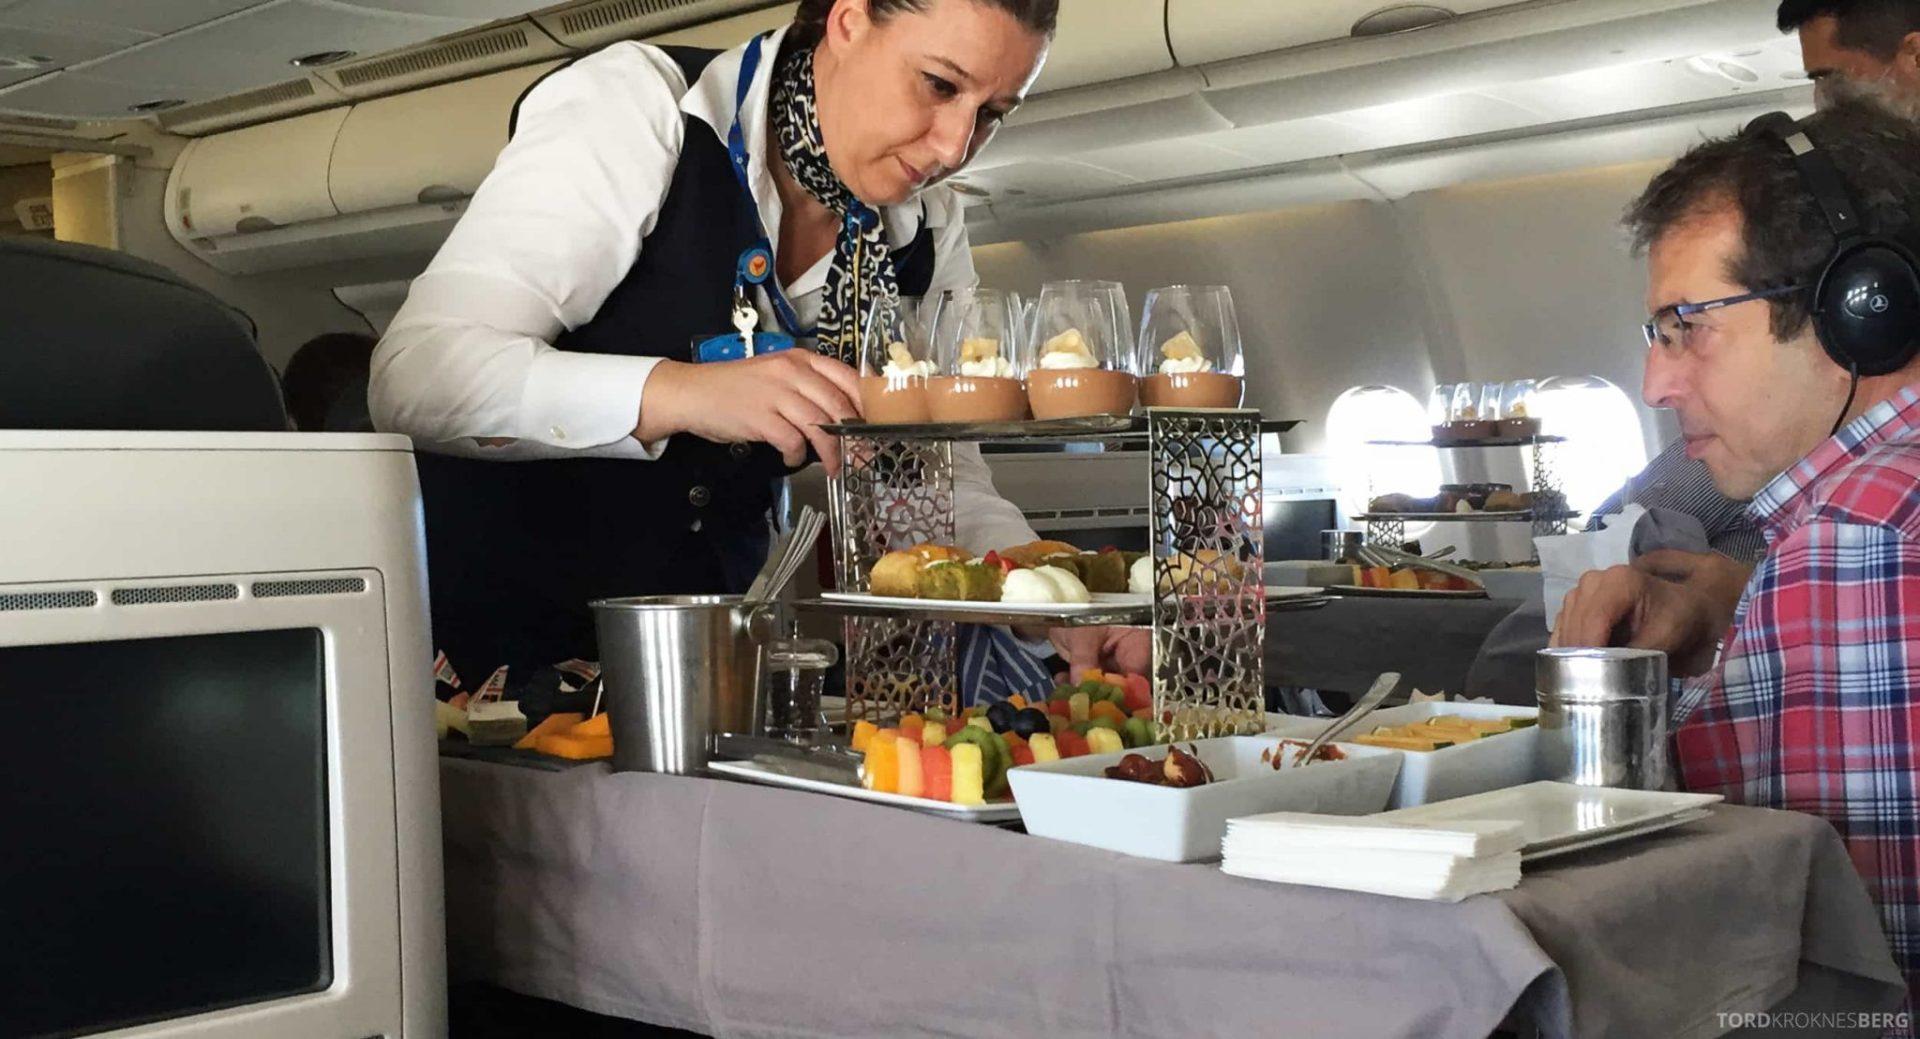 Turkish Airlines Business Class interkontinentalt